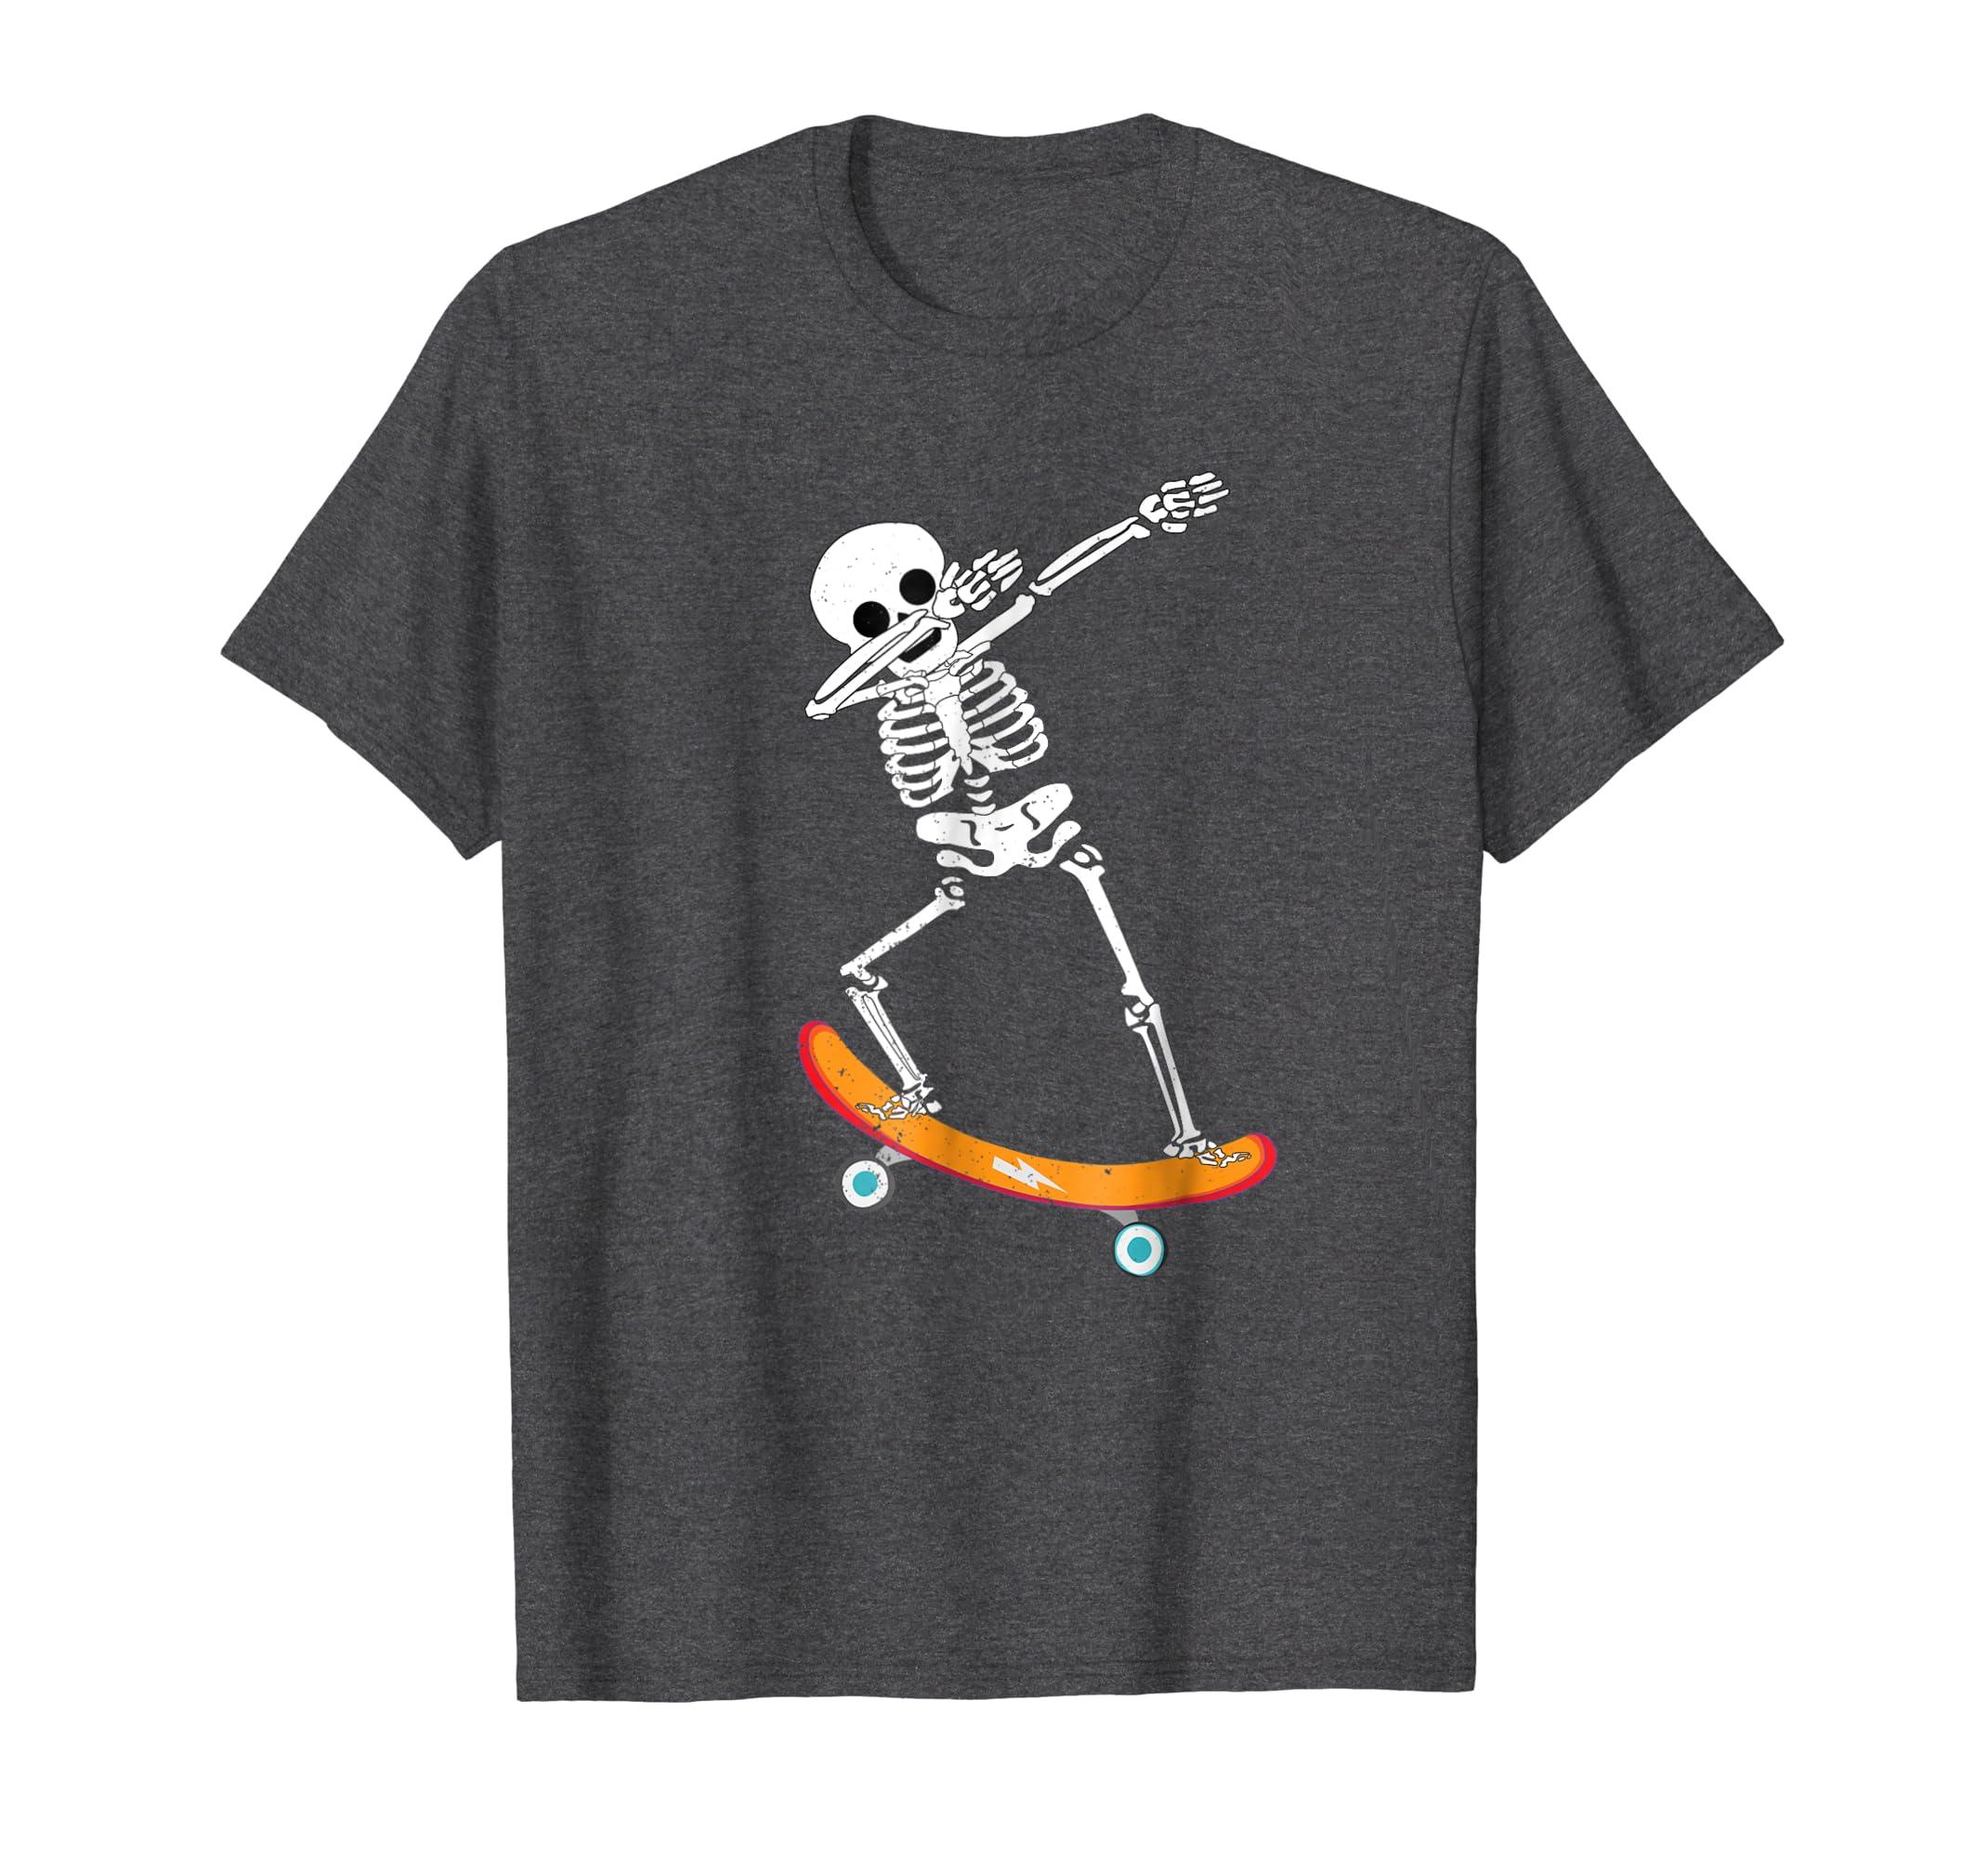 21c87a7d5b3b Amazon.com: Halloween Dabbing Skeleton Skater Shirt Skull Skateboard Tee:  Clothing